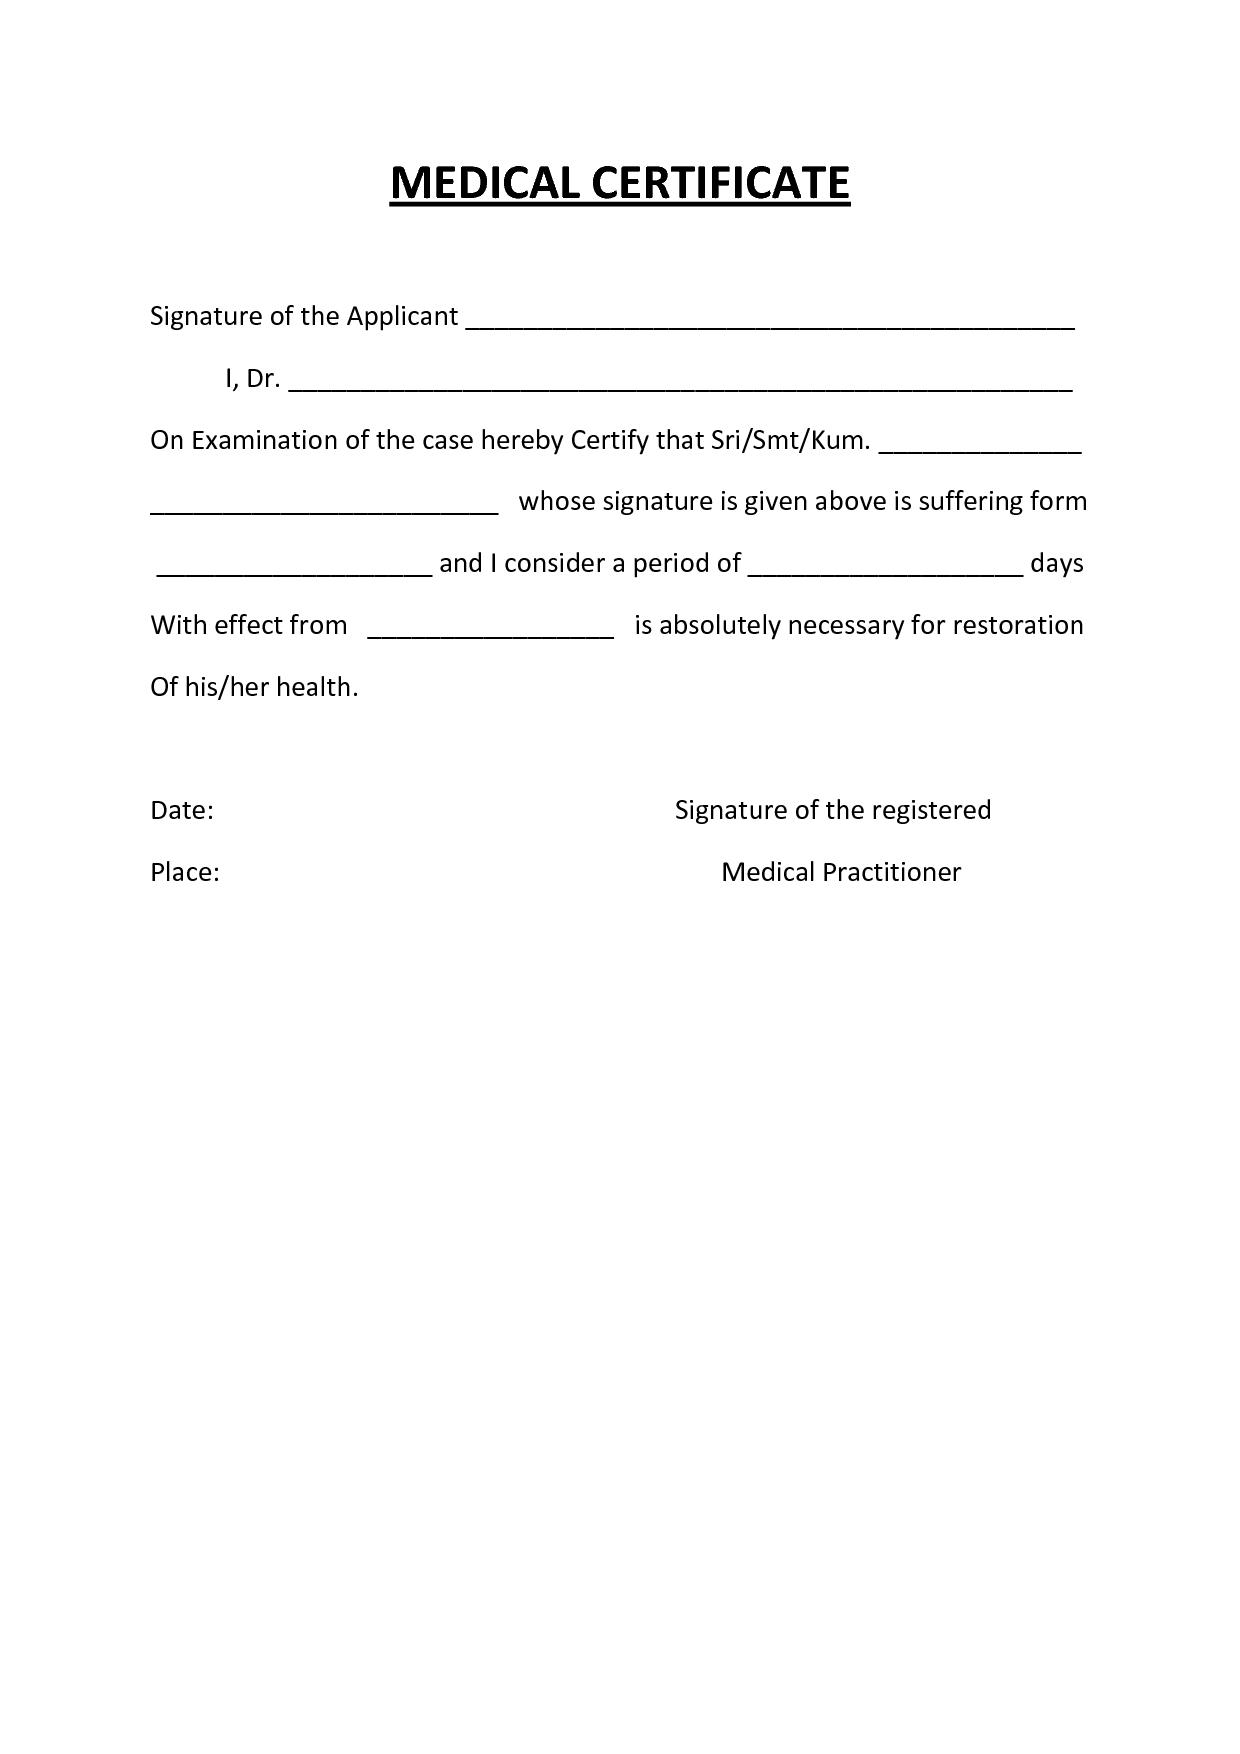 Australian Doctors Certificate Template - Atlantaauctionco For Australian Doctors Certificate Template